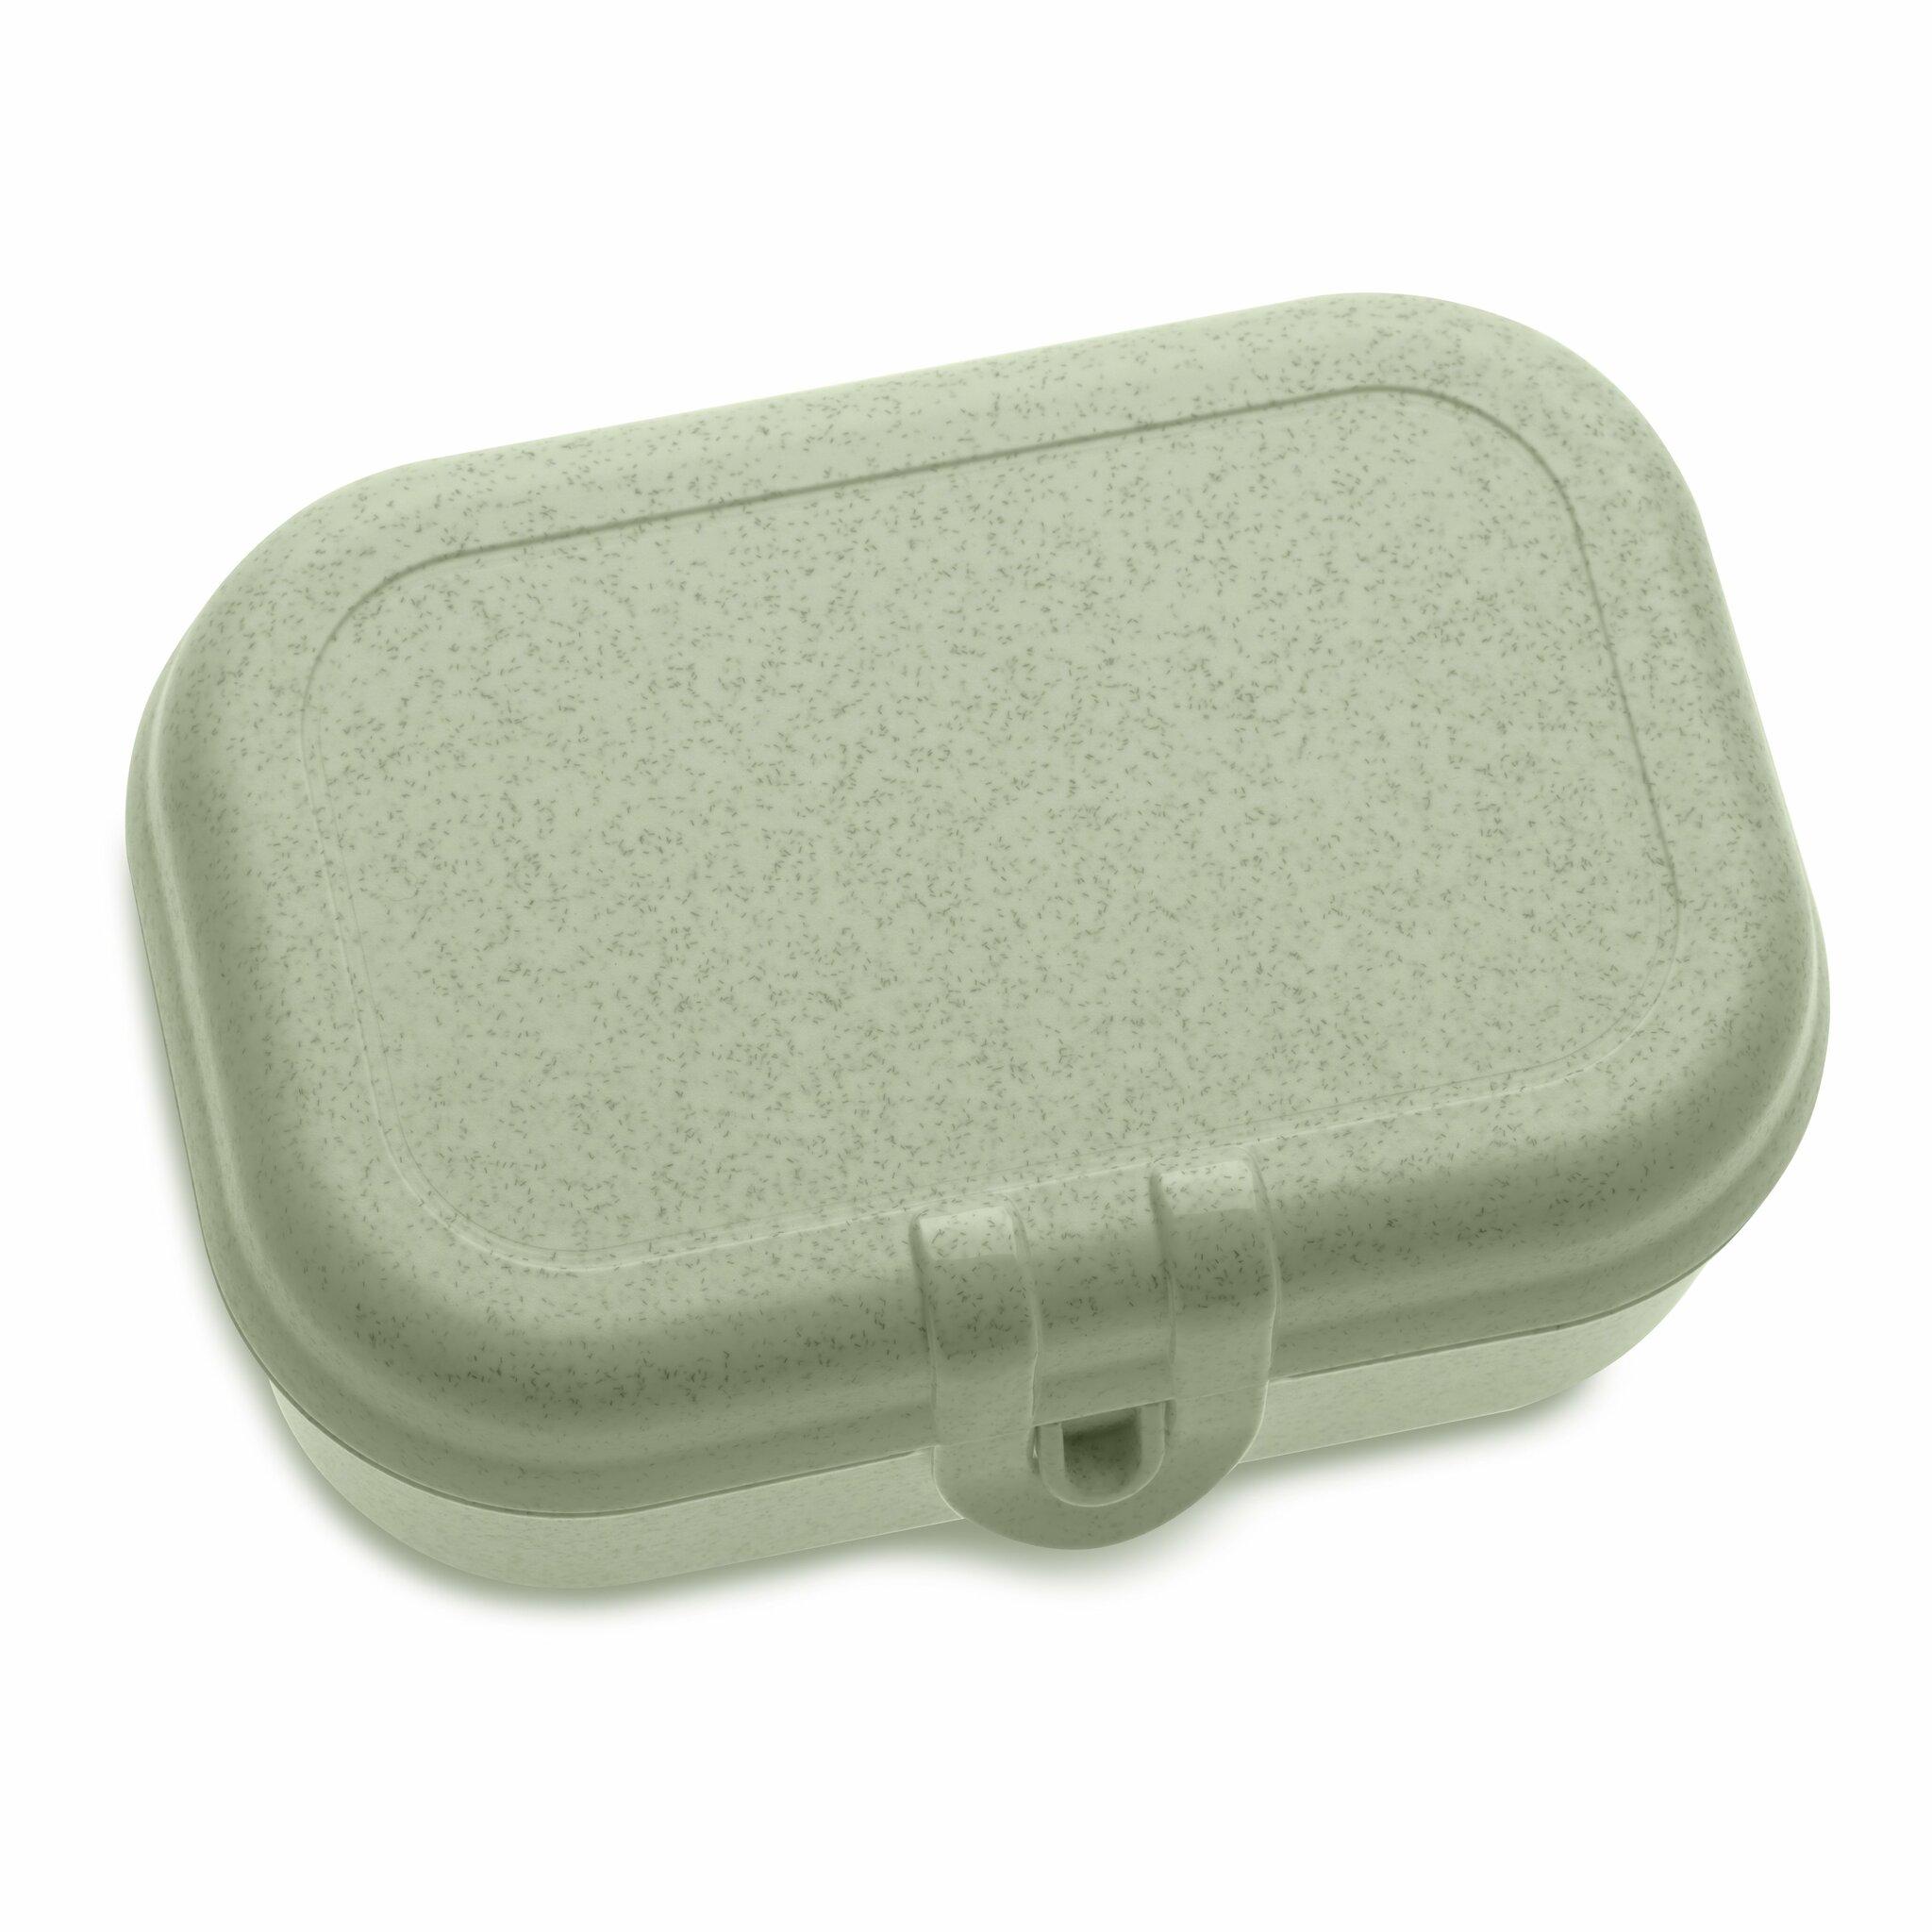 PASCAL S Lunchlåda/Lunchbox Organic 2-pack